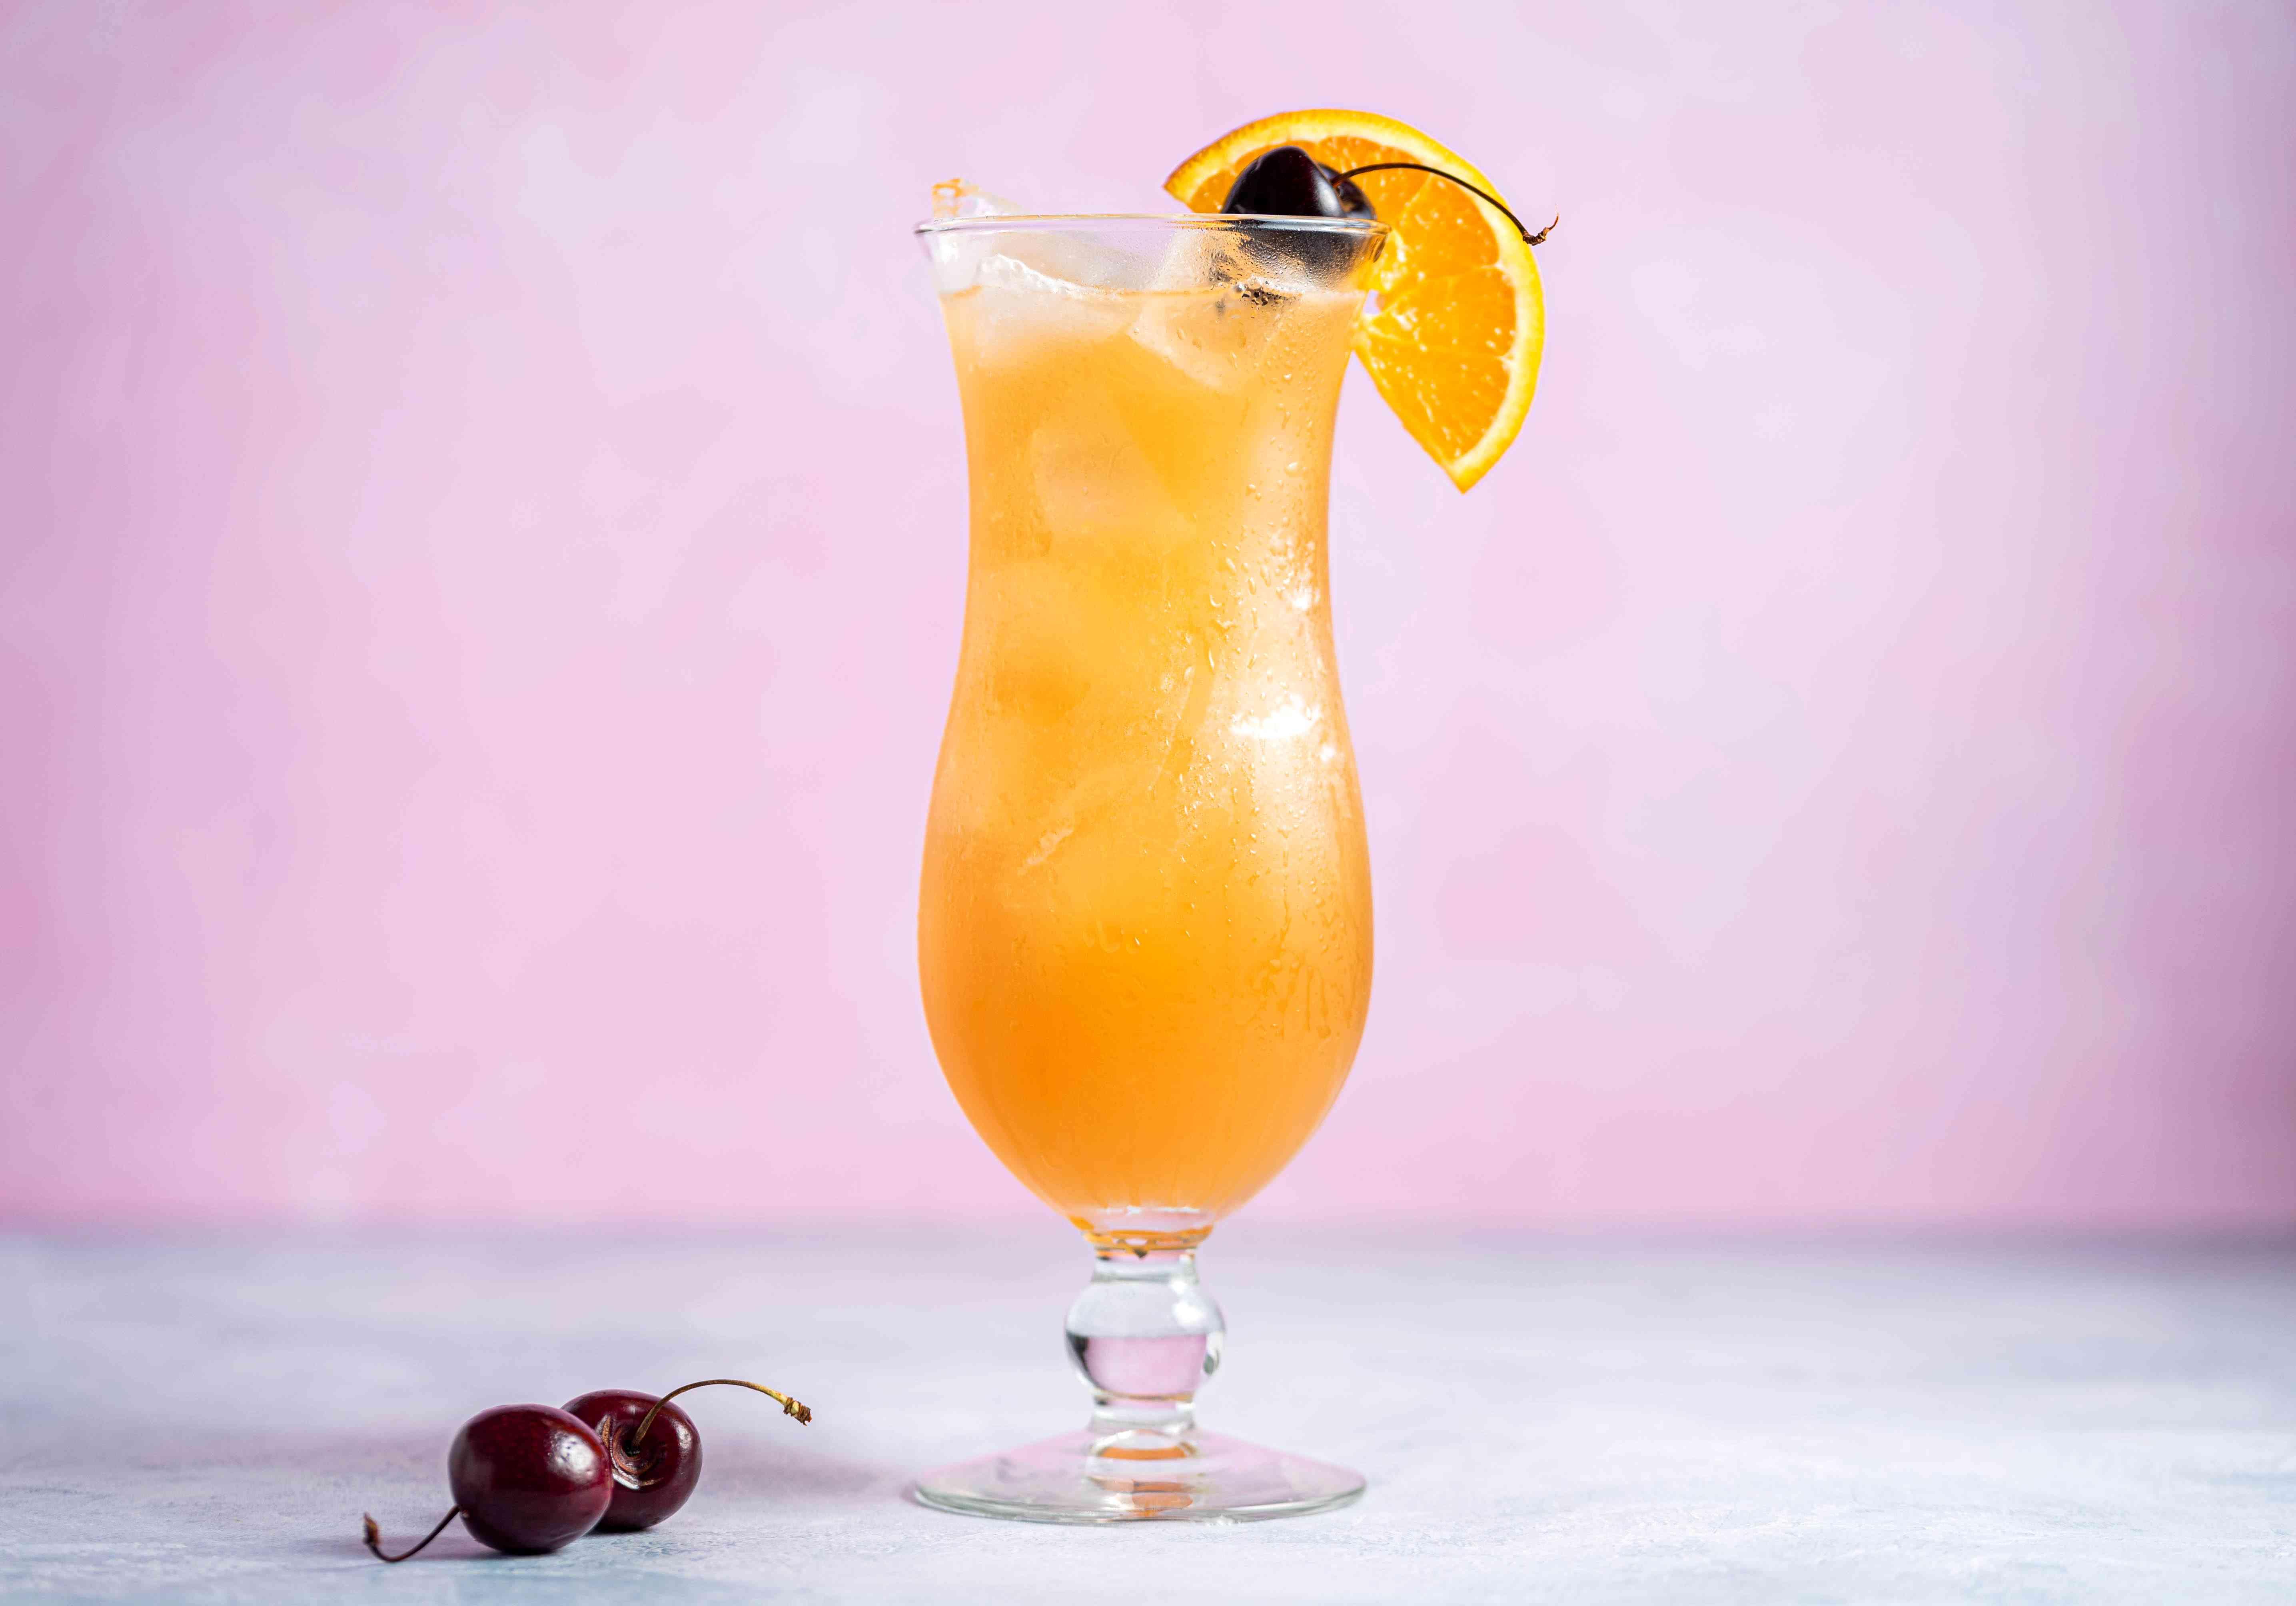 Classic Hurricane drink recipe